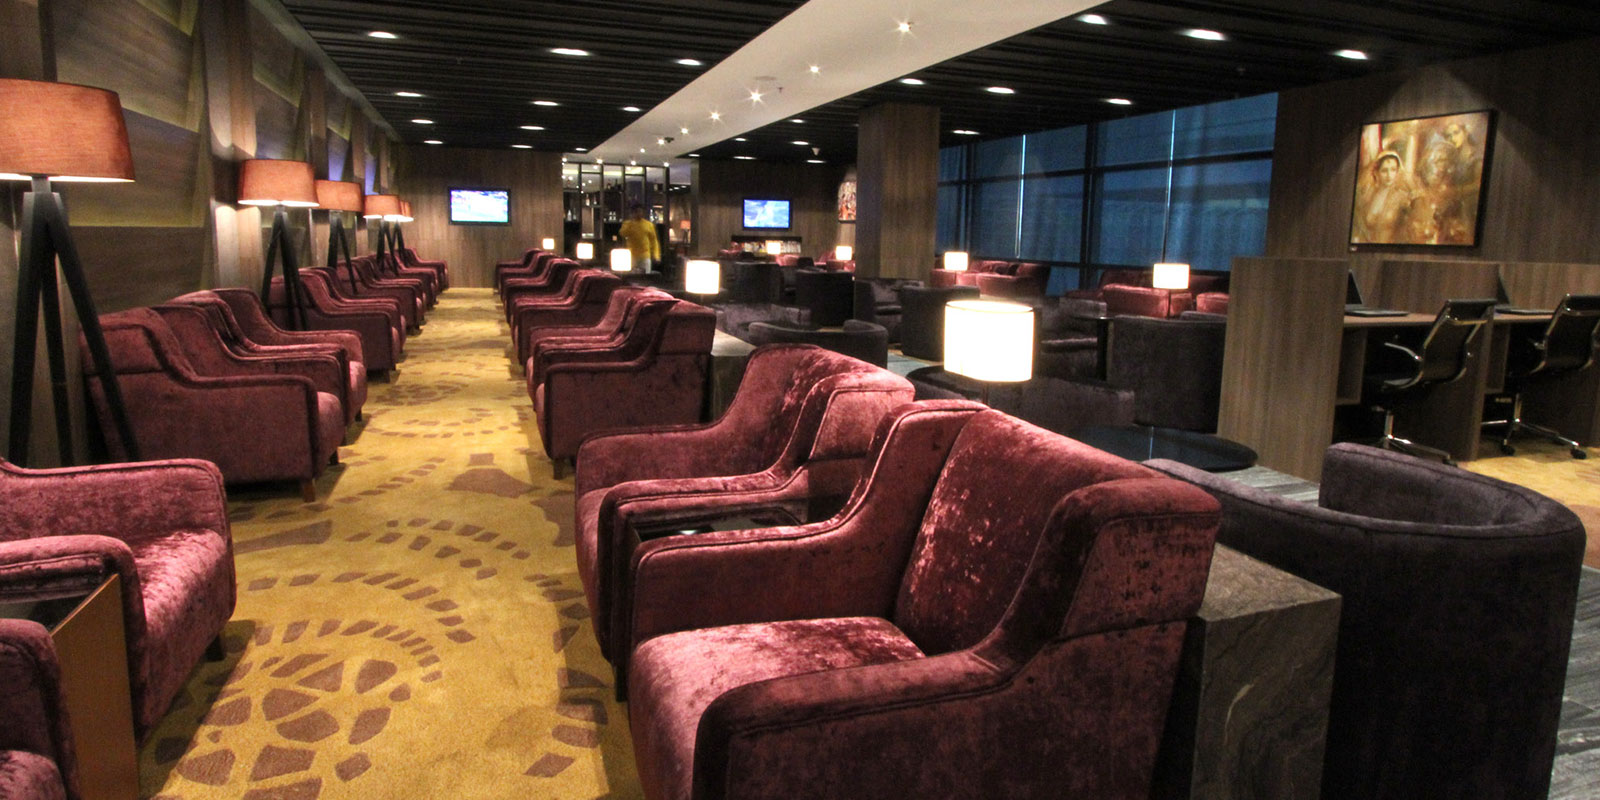 Plaza Premium Lounge | Plaza Premium Lounge (Lounge B, Level